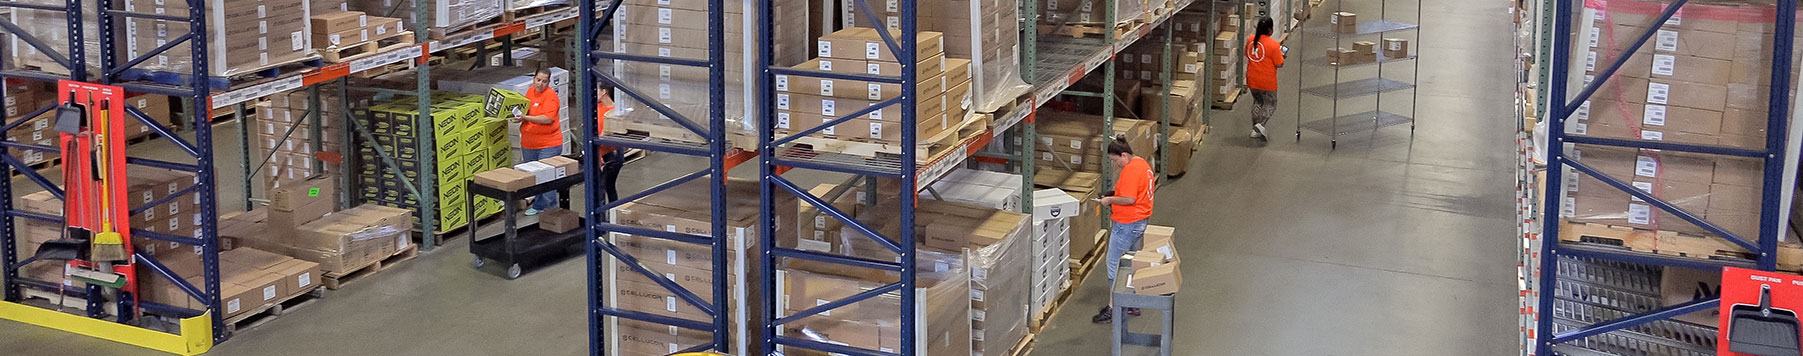 warehouse labor management